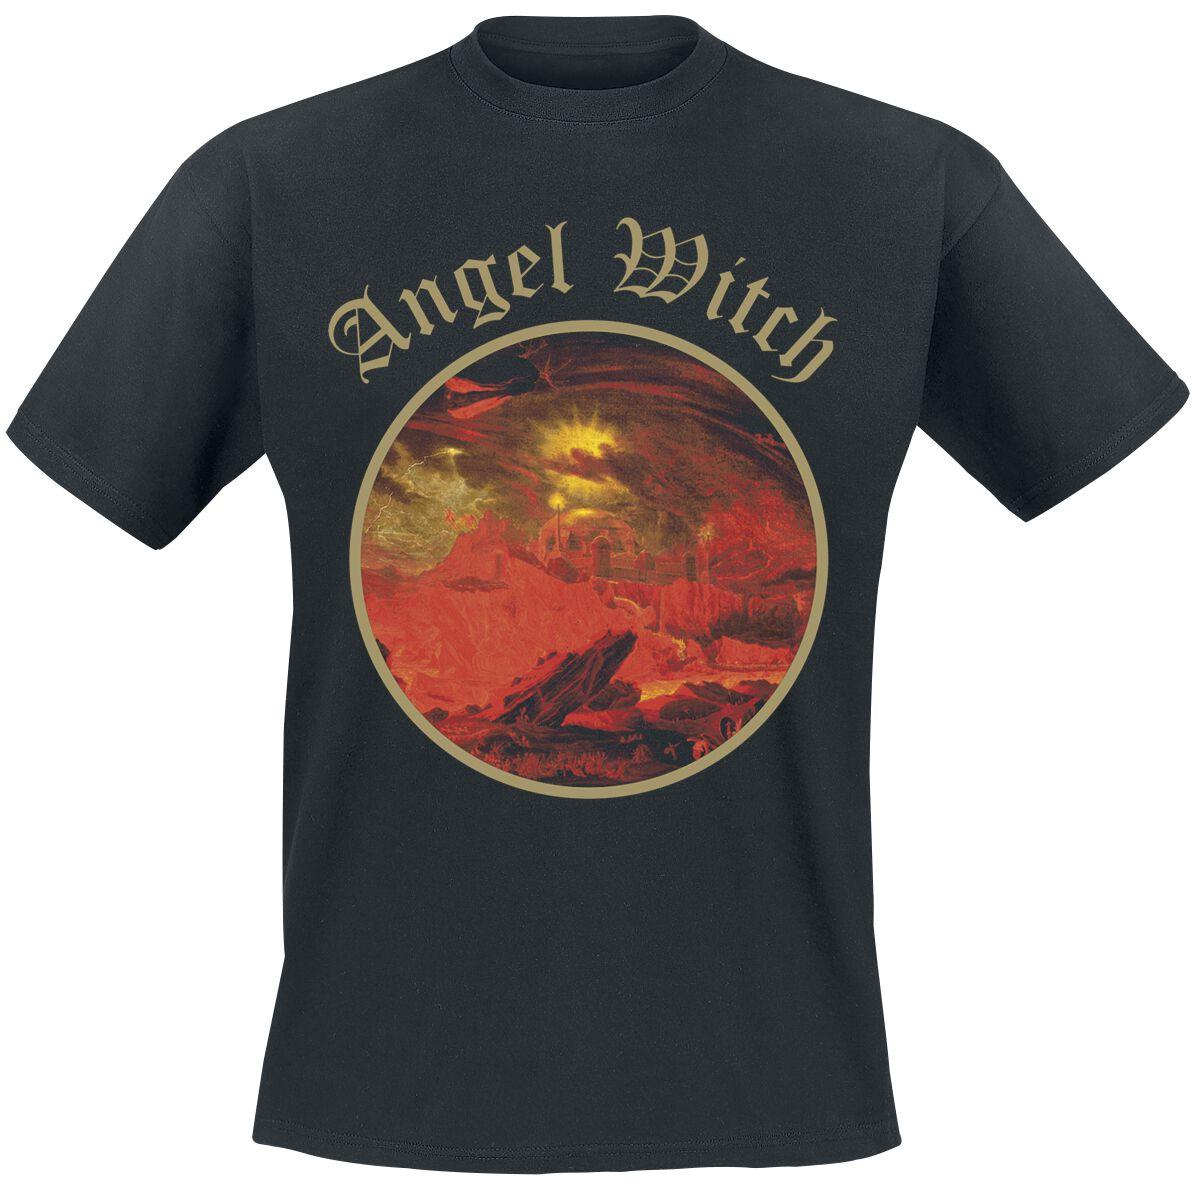 Image of Angel Witch Angel Witch T-Shirt schwarz